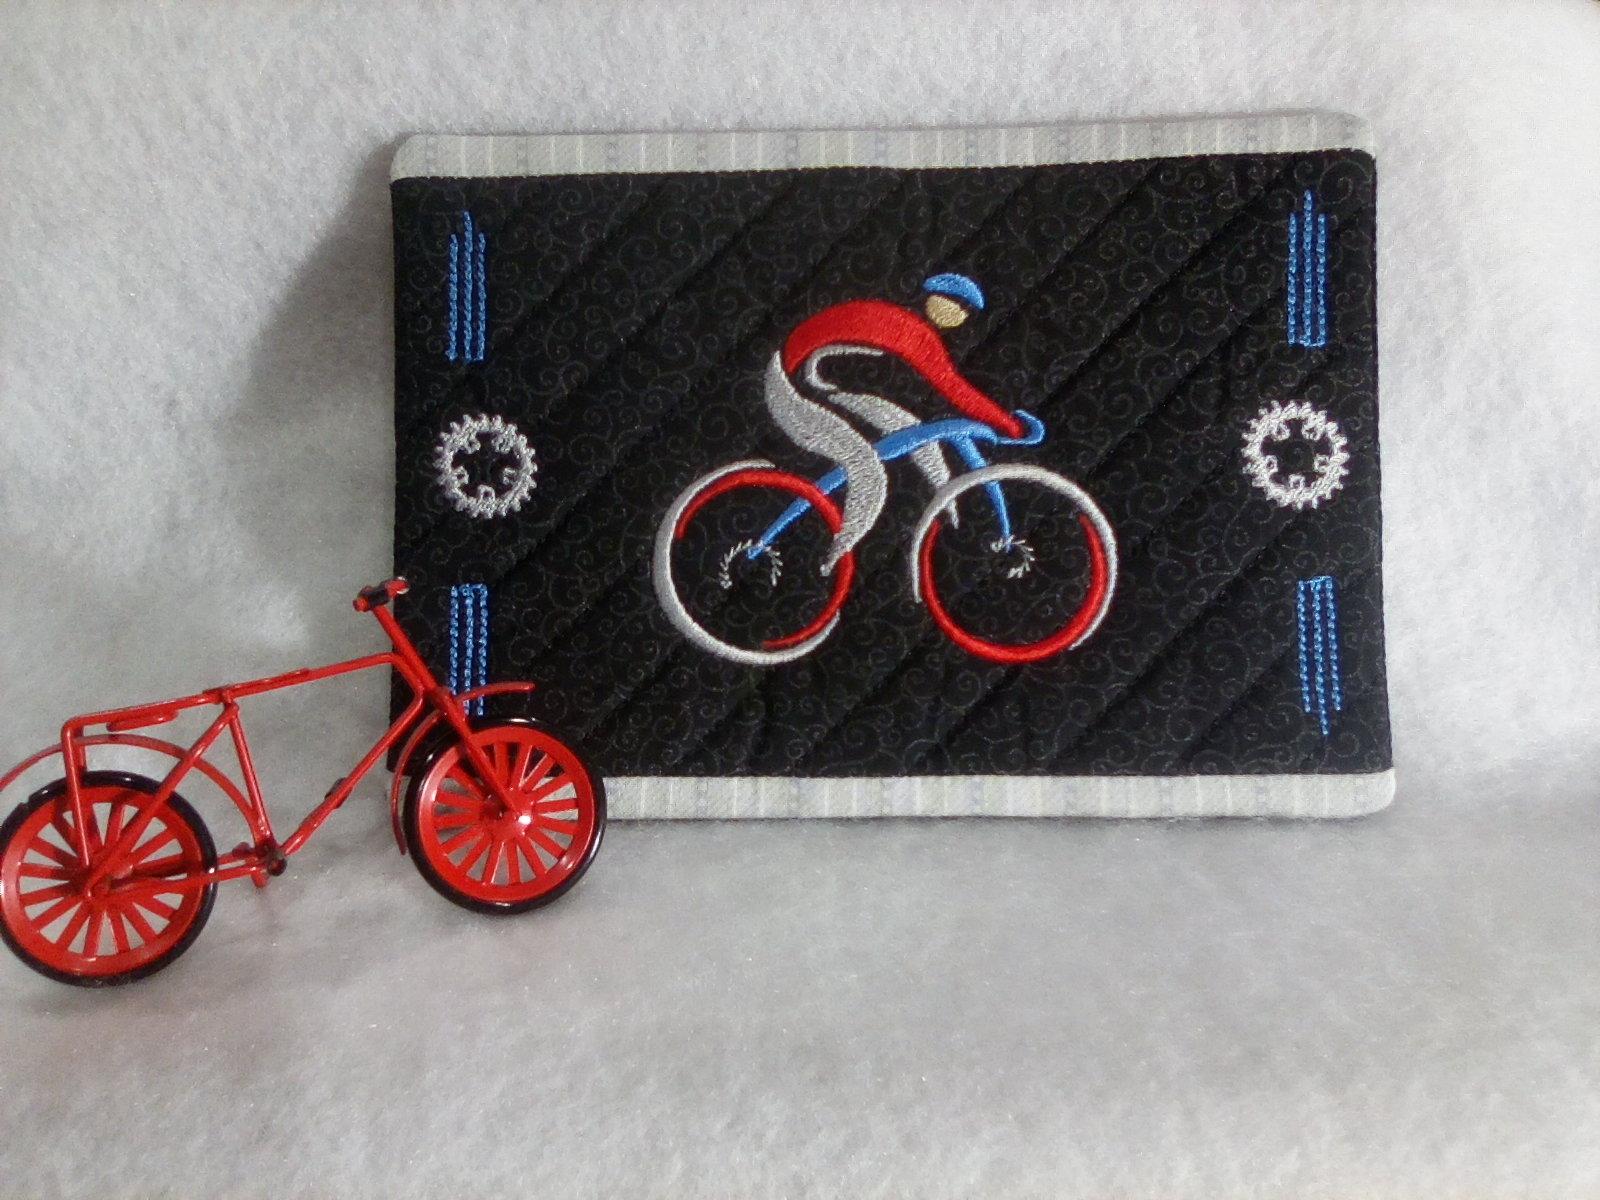 Biking MR-12